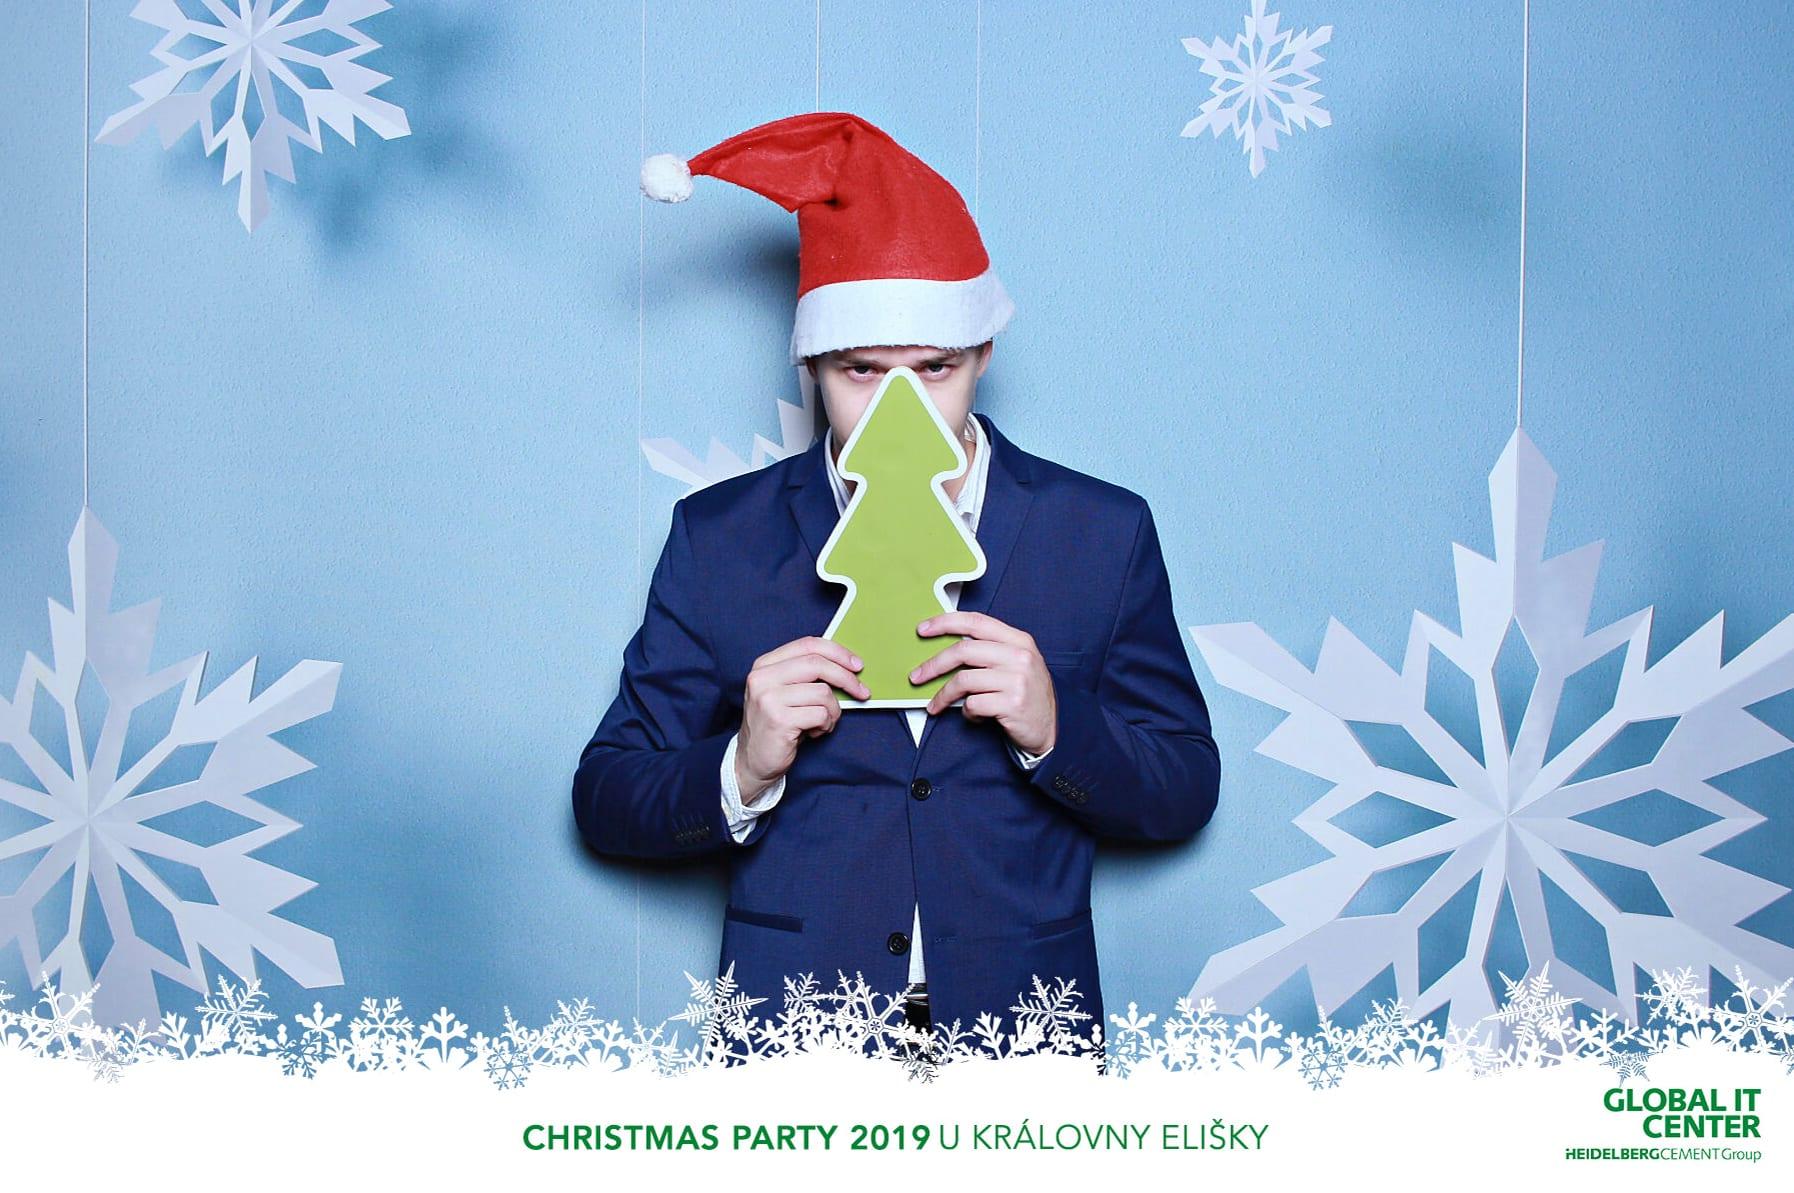 fotokoutek-vanocni-vecirek-global-it-center-christmas-party-6-12-2019-682130